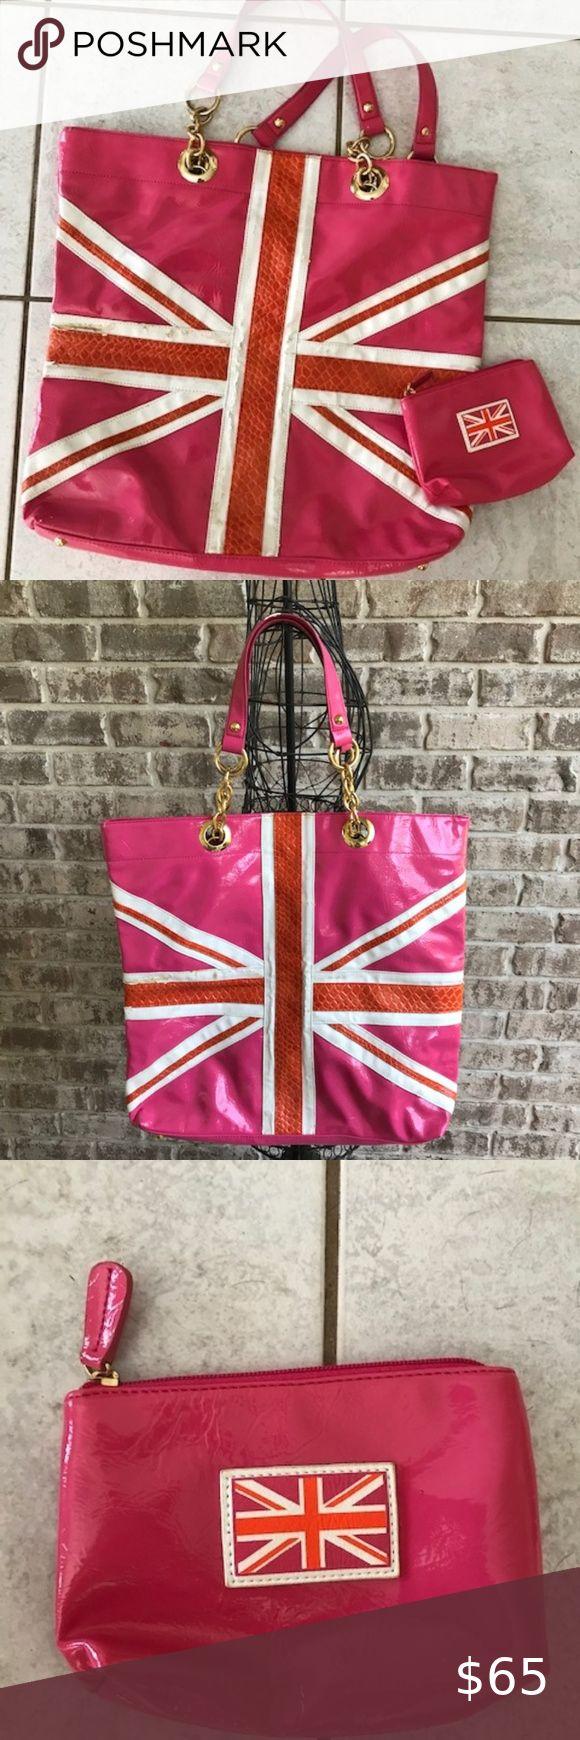 Twiggy London Handbag + Cosmetic Bag Vintage in 2020